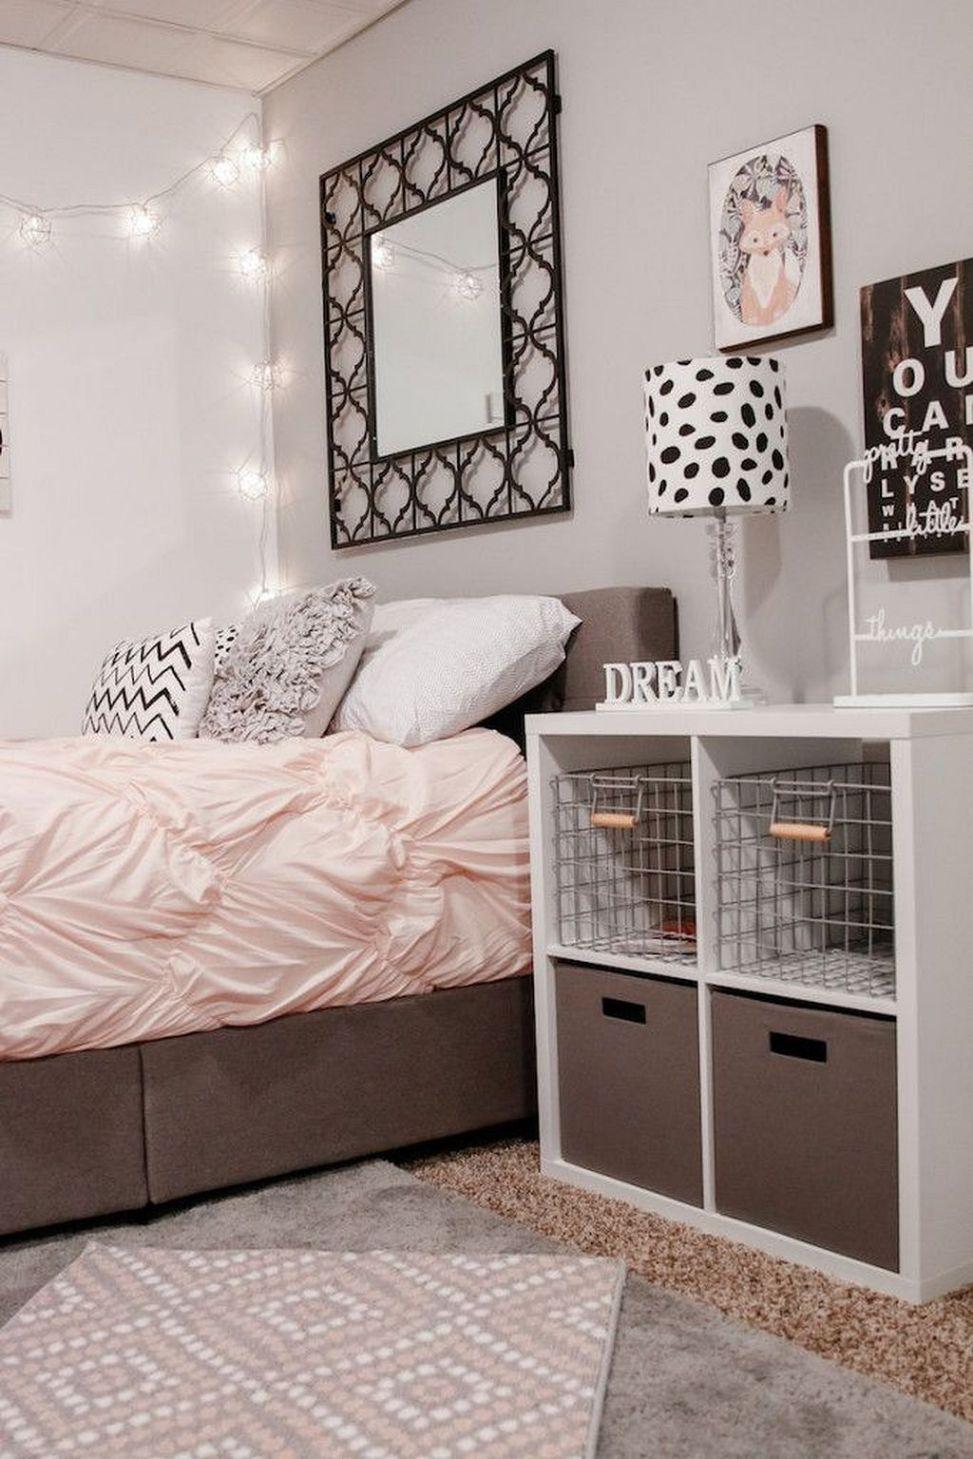 Cool DIY Hipster Bedroom Decorations Ideas Girl bedroom